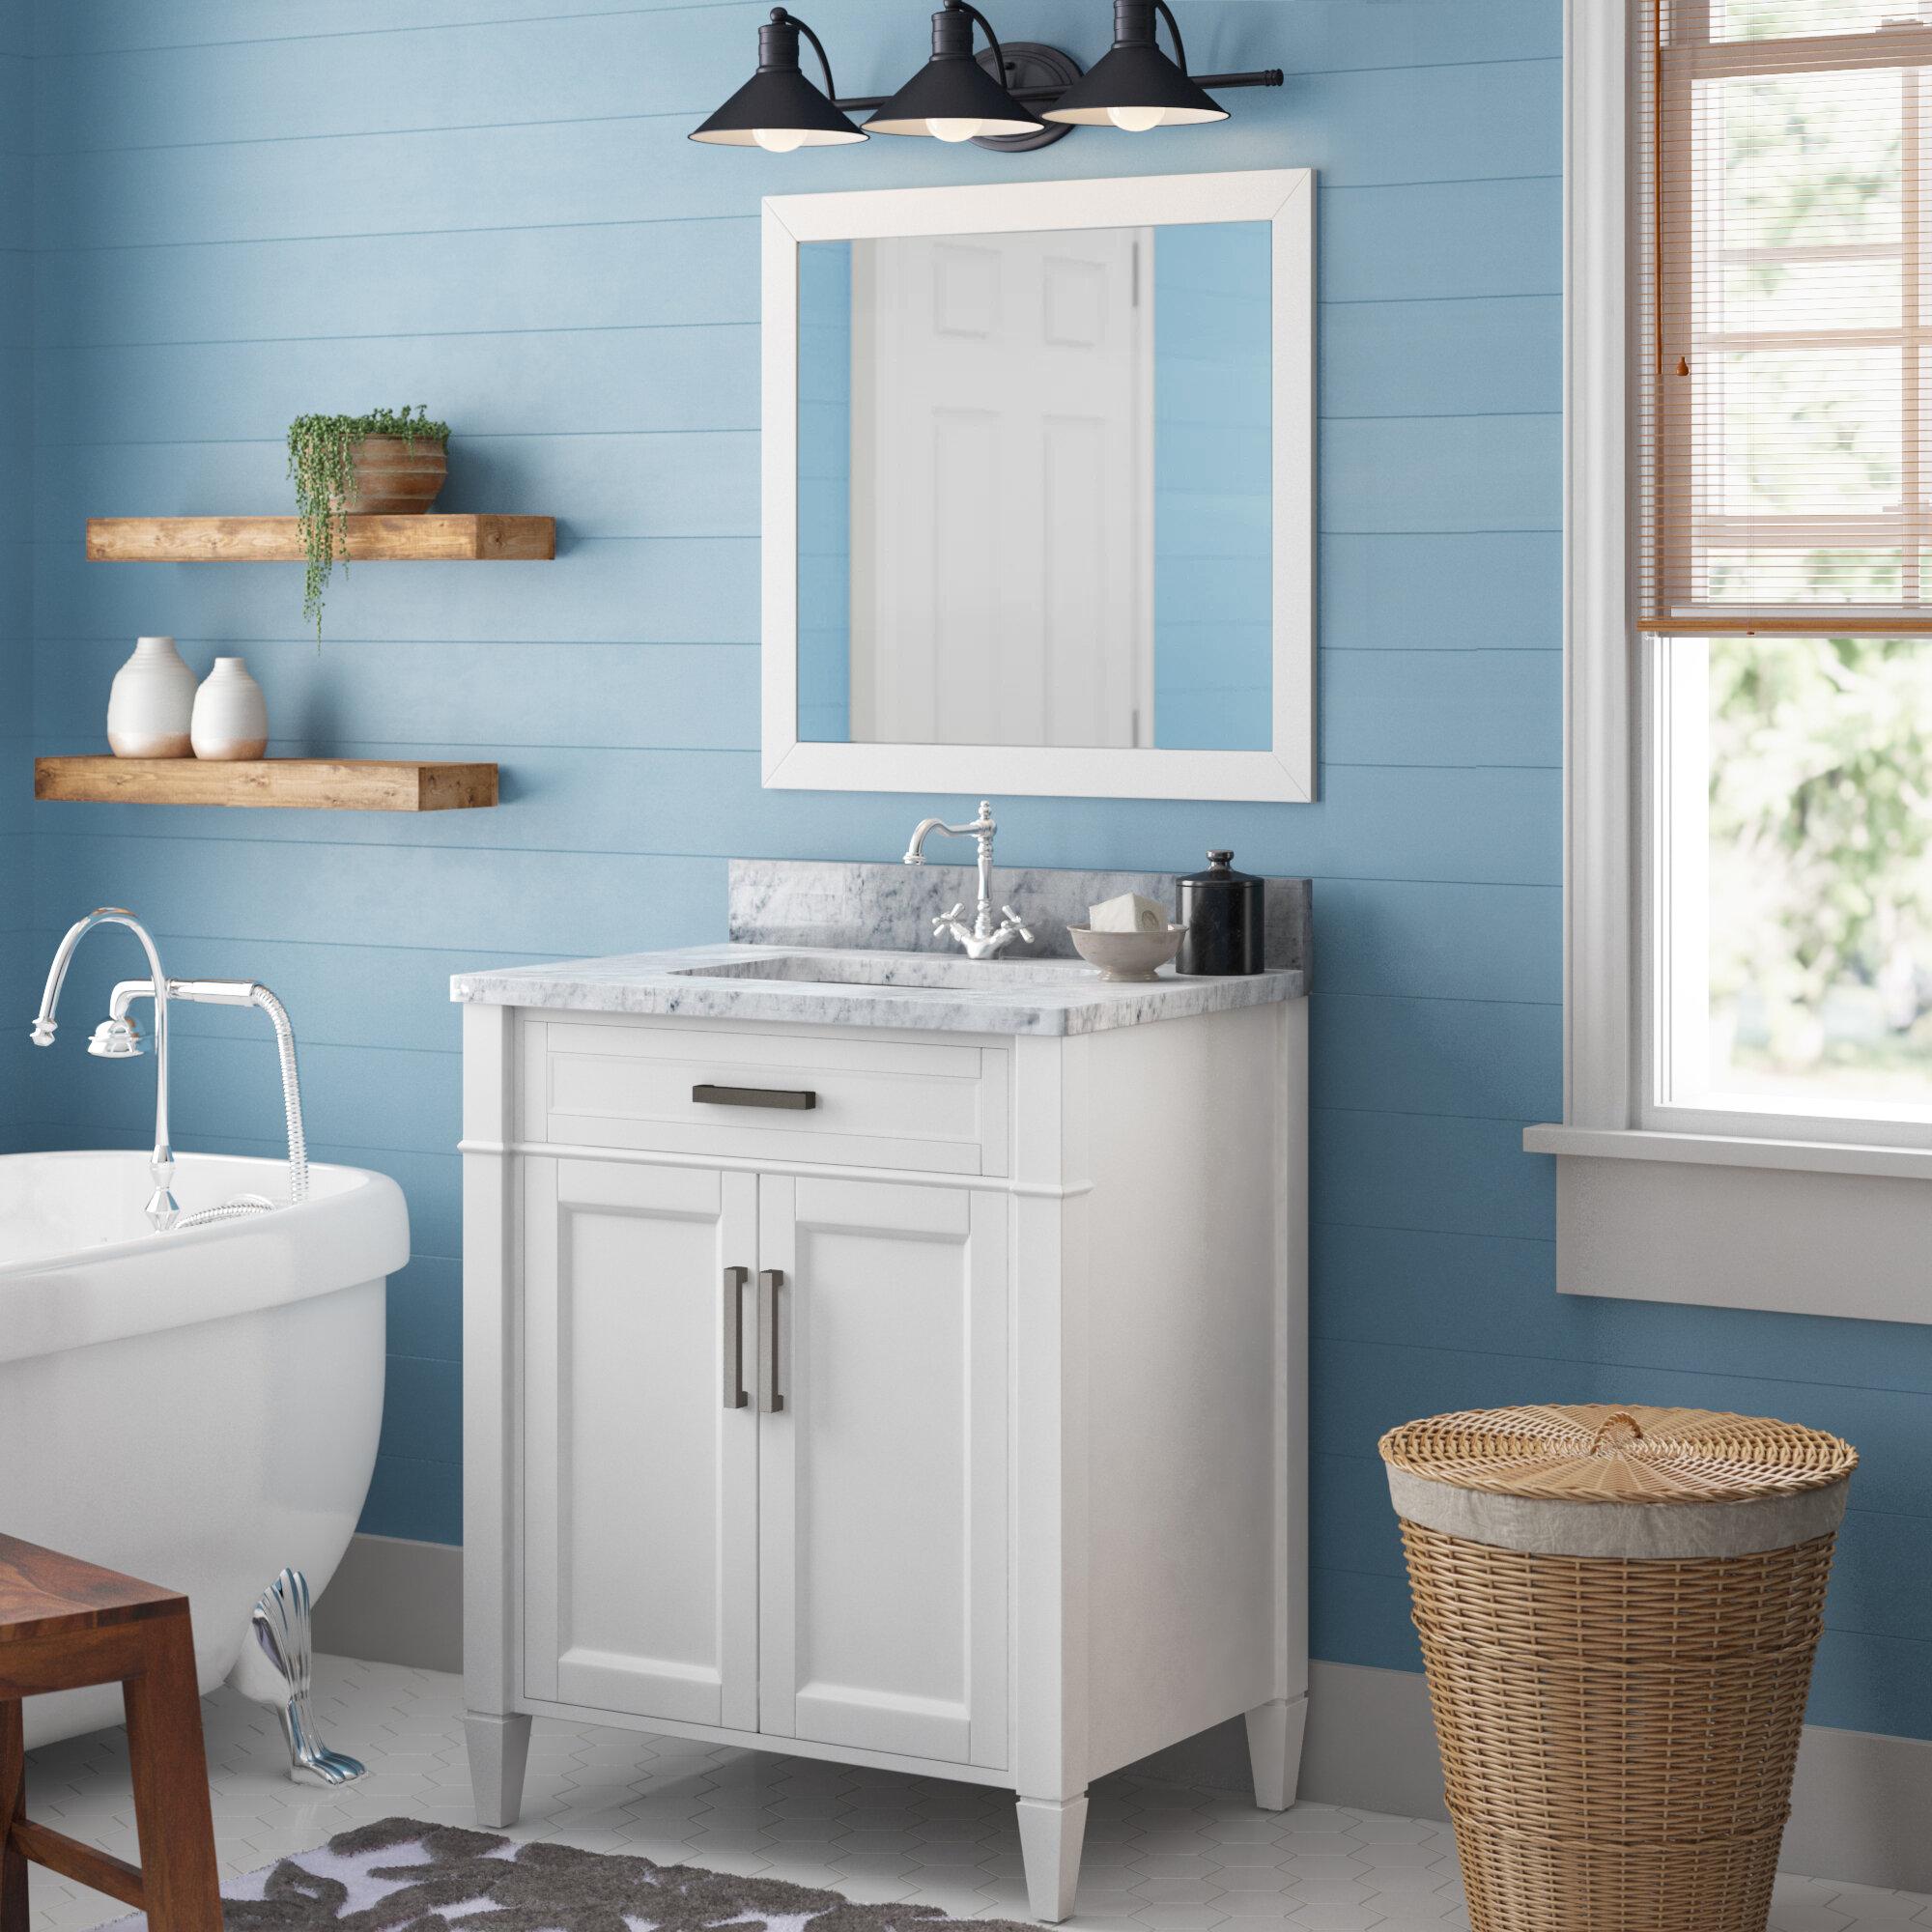 Gracie Oaks Lachine 30 Single Bathroom Vanity Set With Mirror Reviews Wayfair